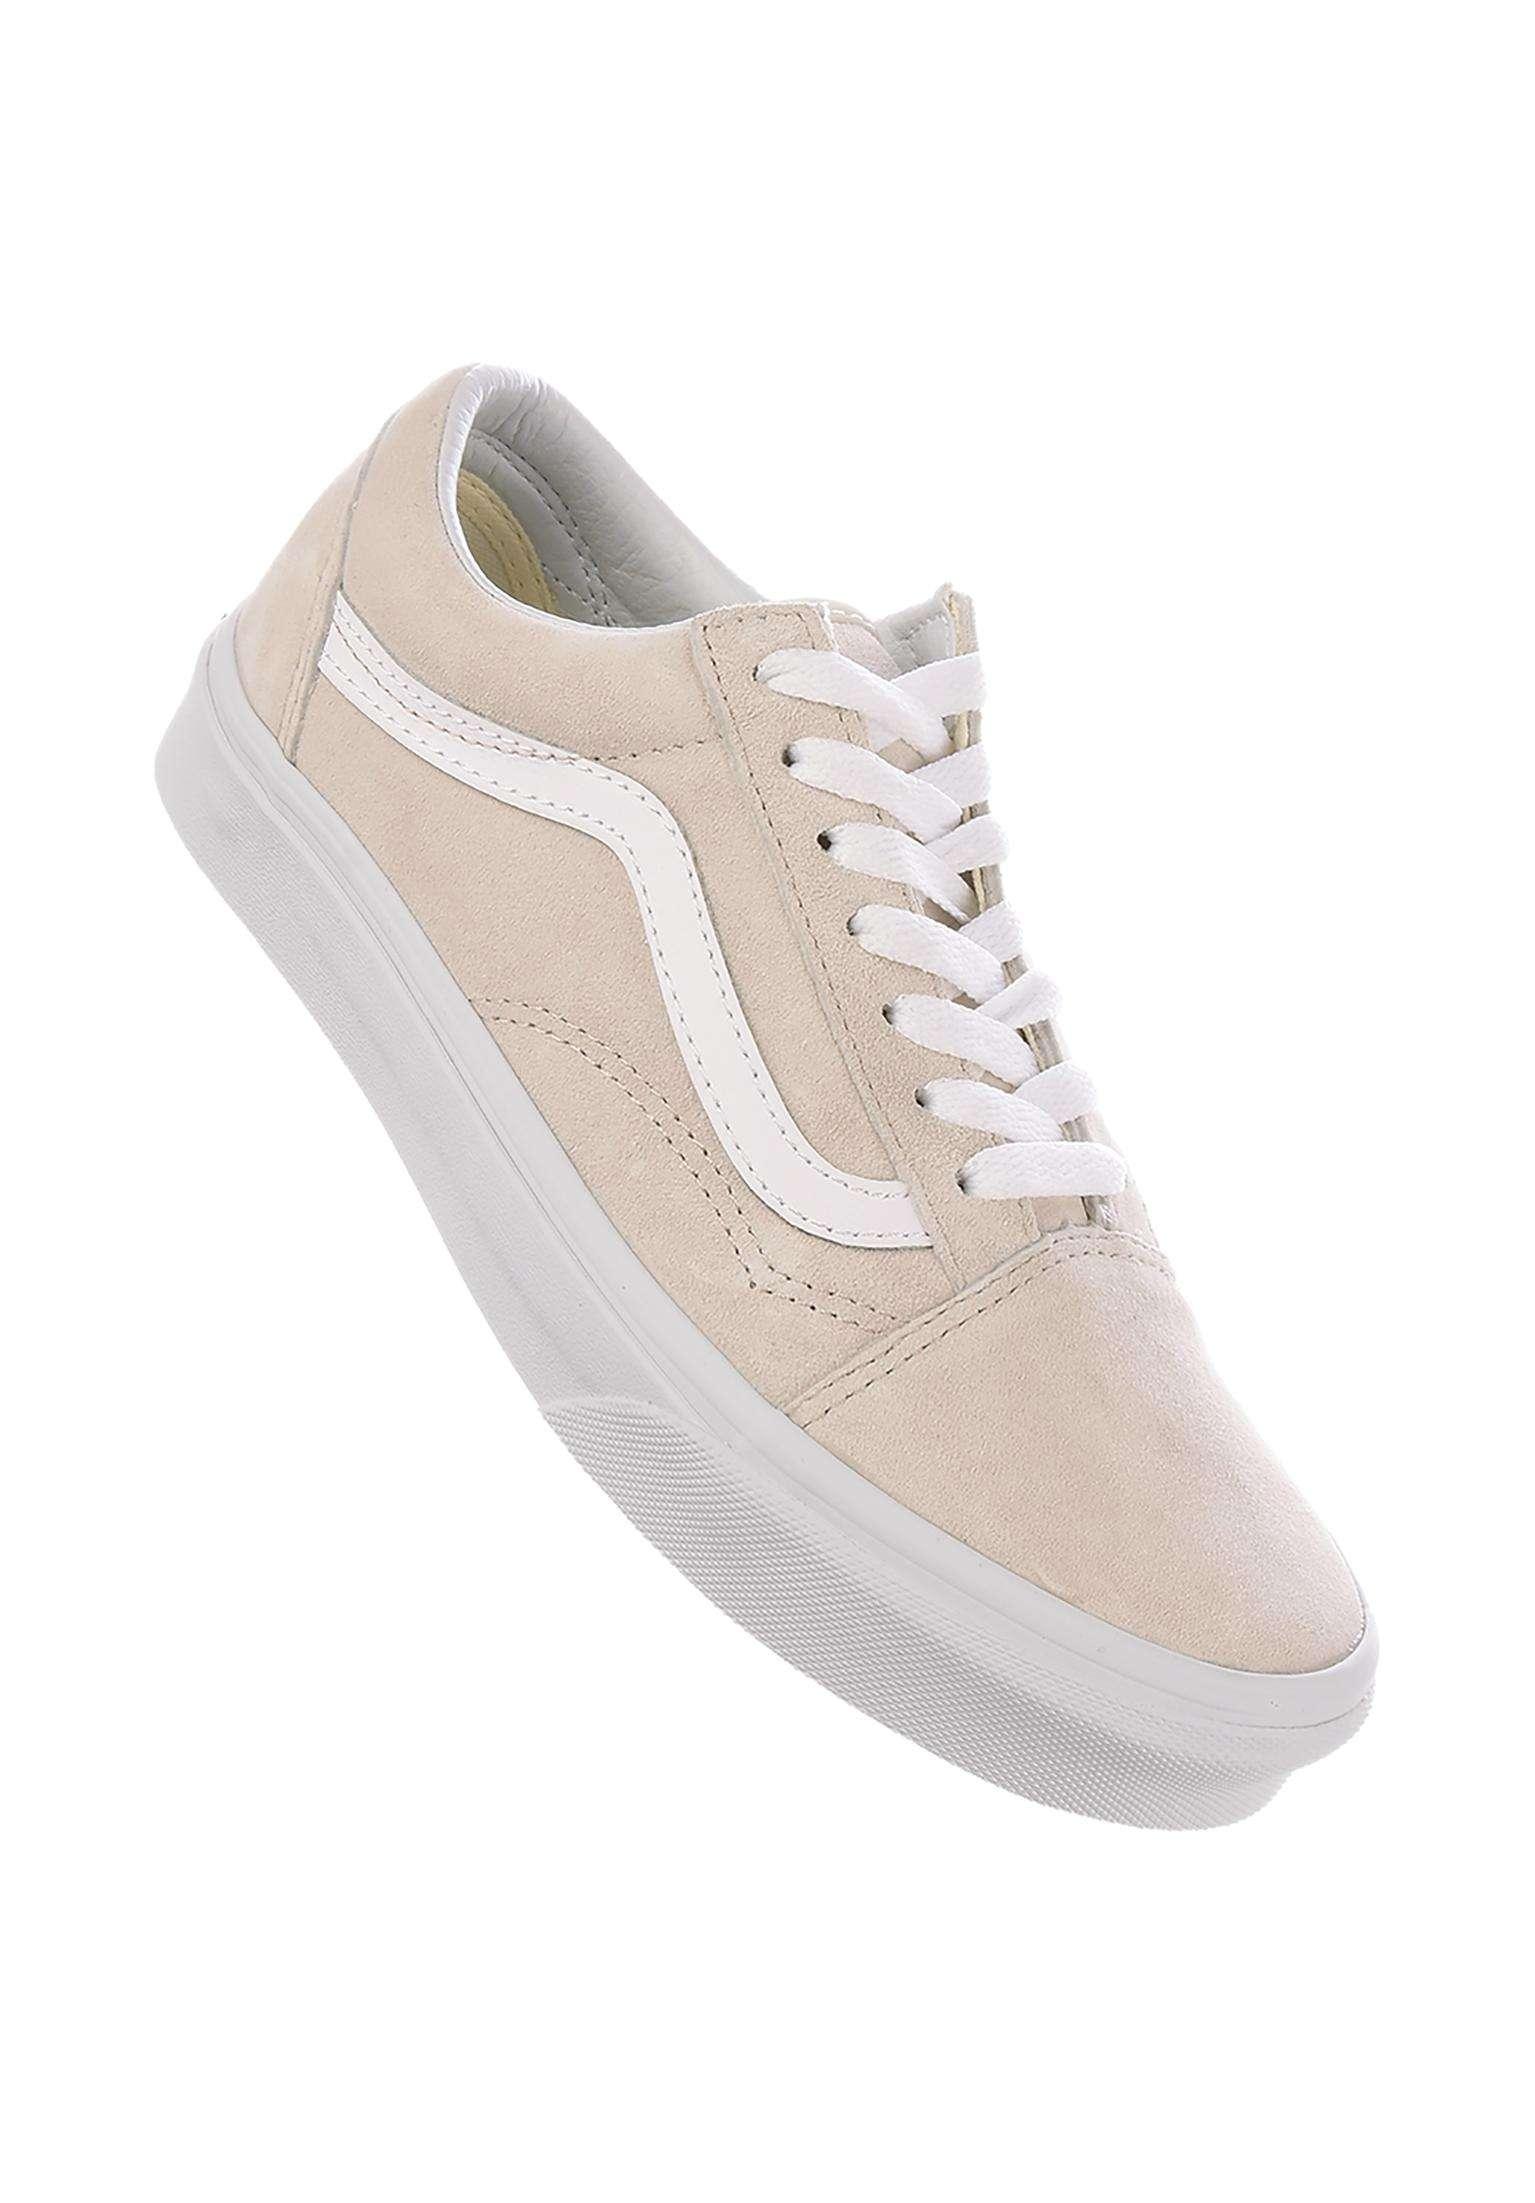 8136c67684 Old Skool Vans All Shoes in moonbeam-truewhite for Women